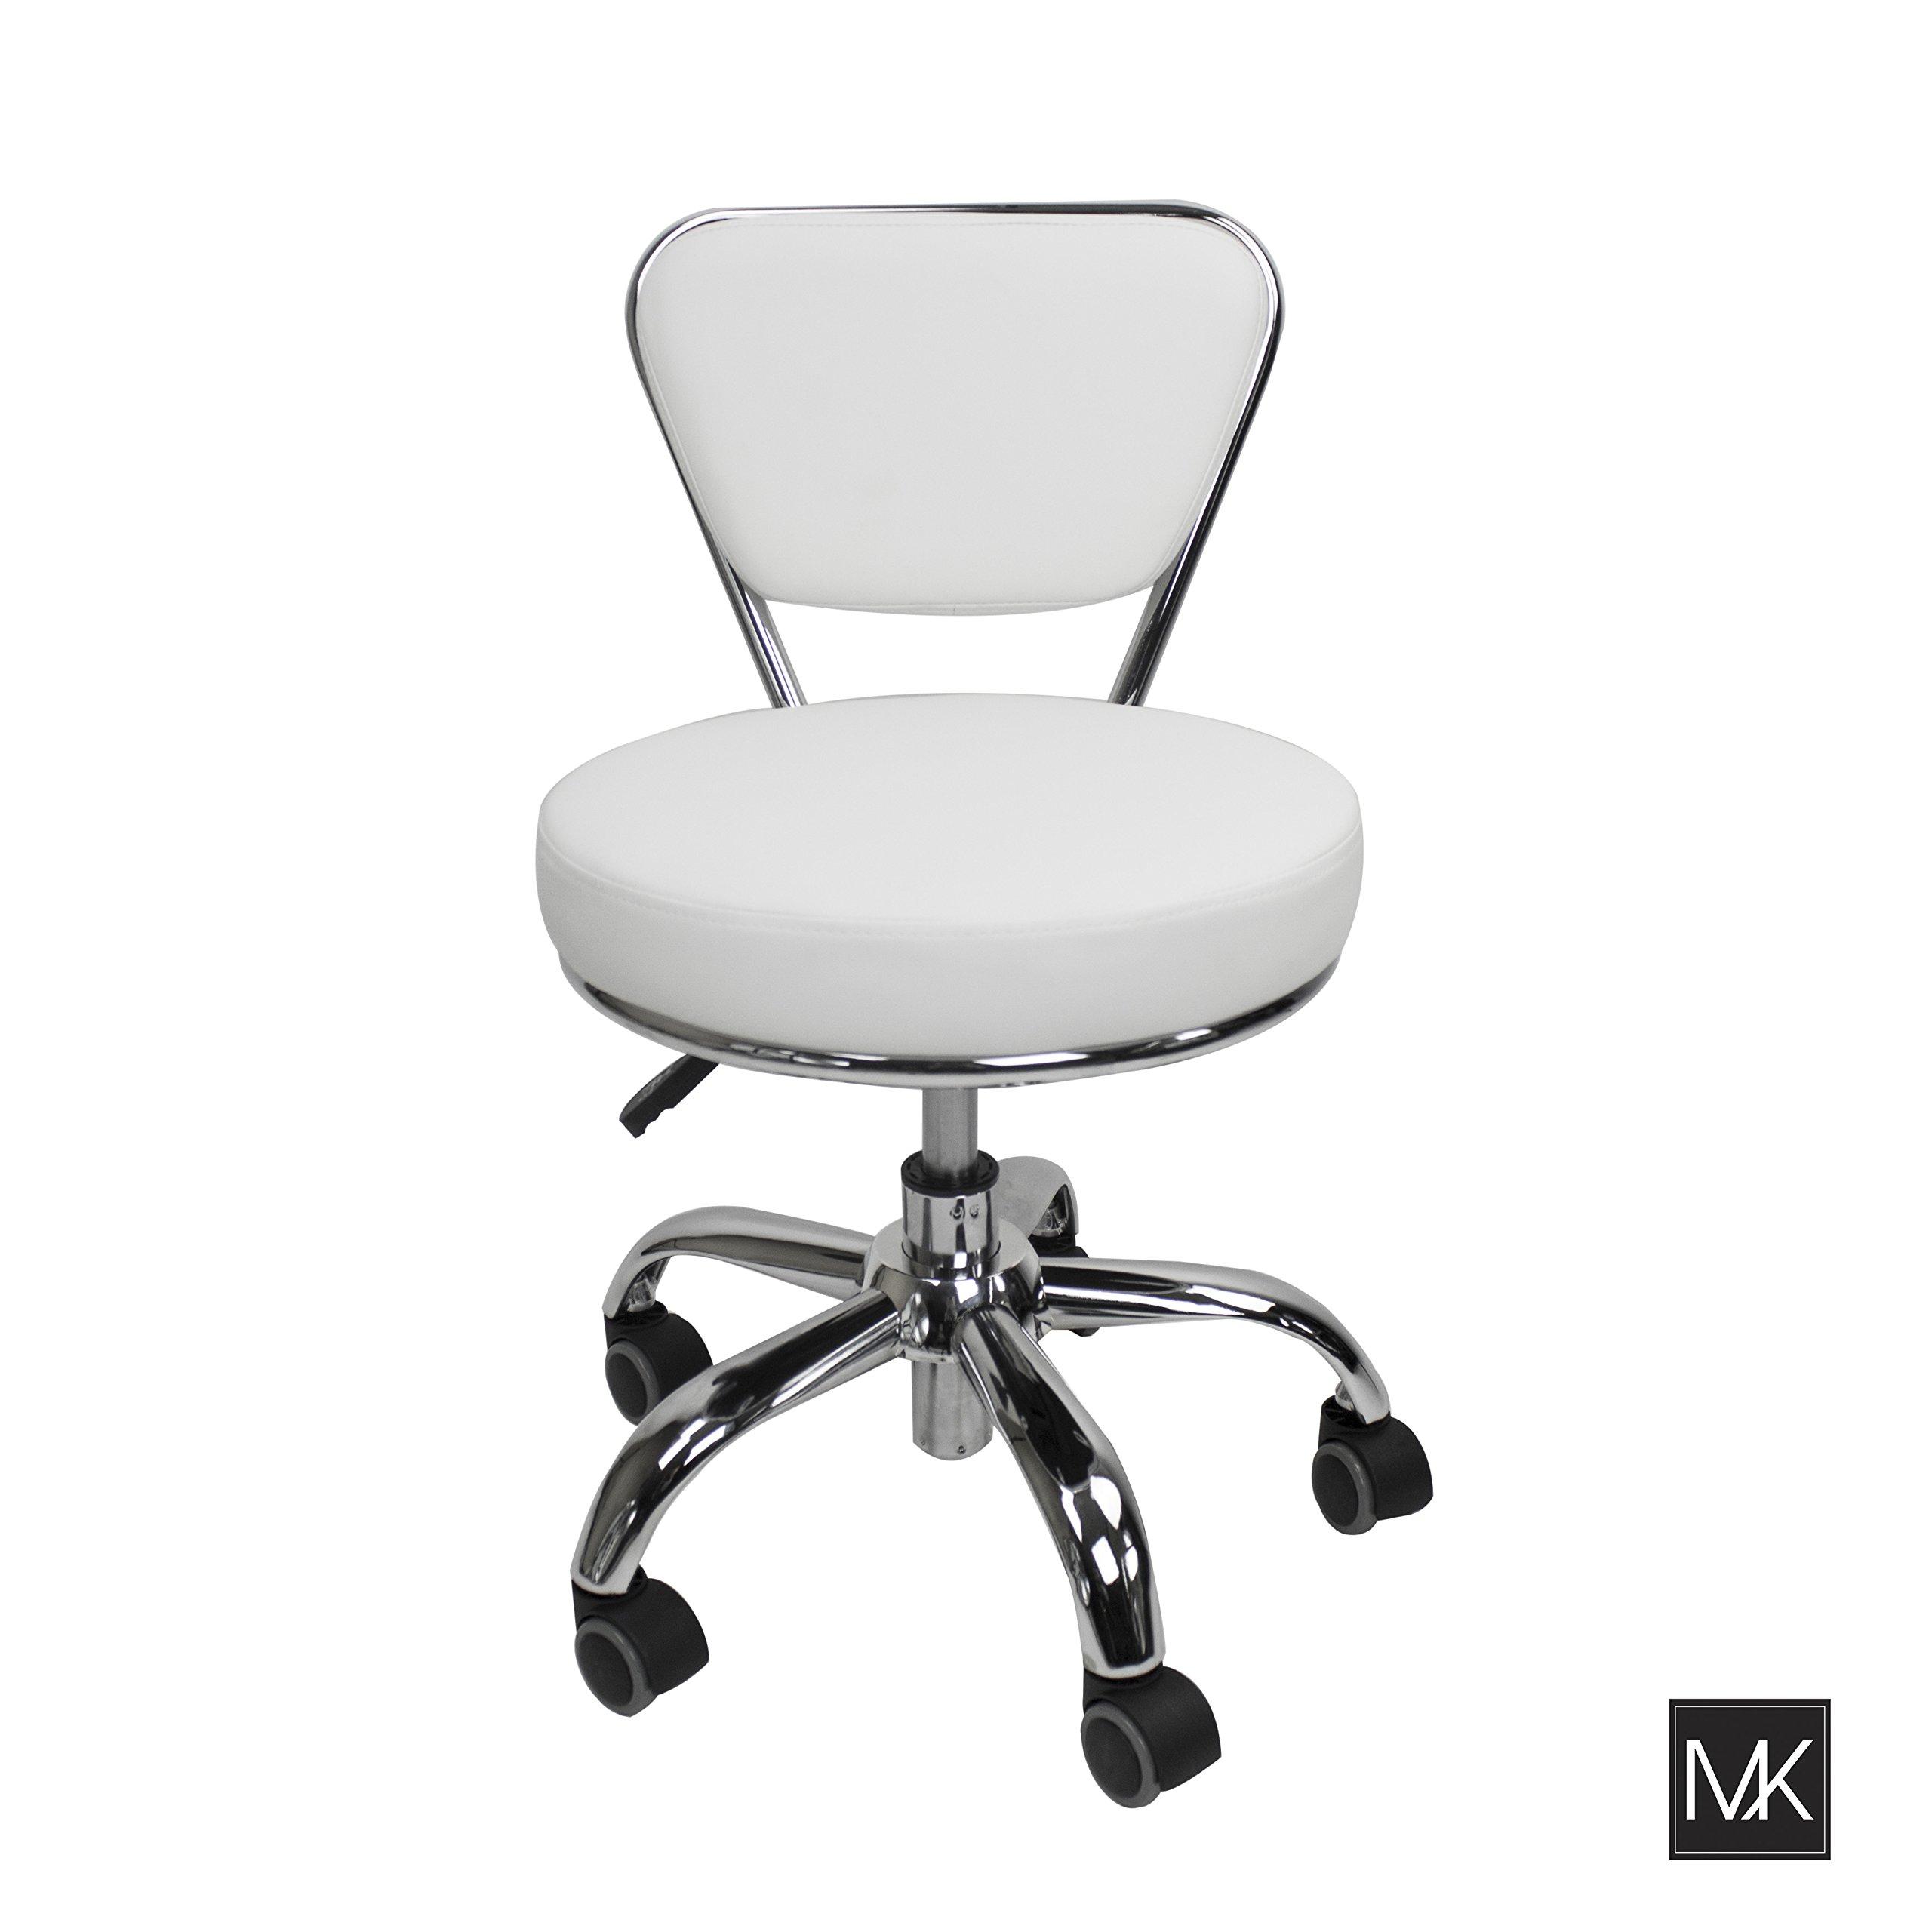 MAYAKOBA Salon Nail Pedicure Stool Pedicure Chair DAYTON WHITE Pneumatic, Adjustable, Rolling Salon Furniture & Equipment by MAYAKOBA